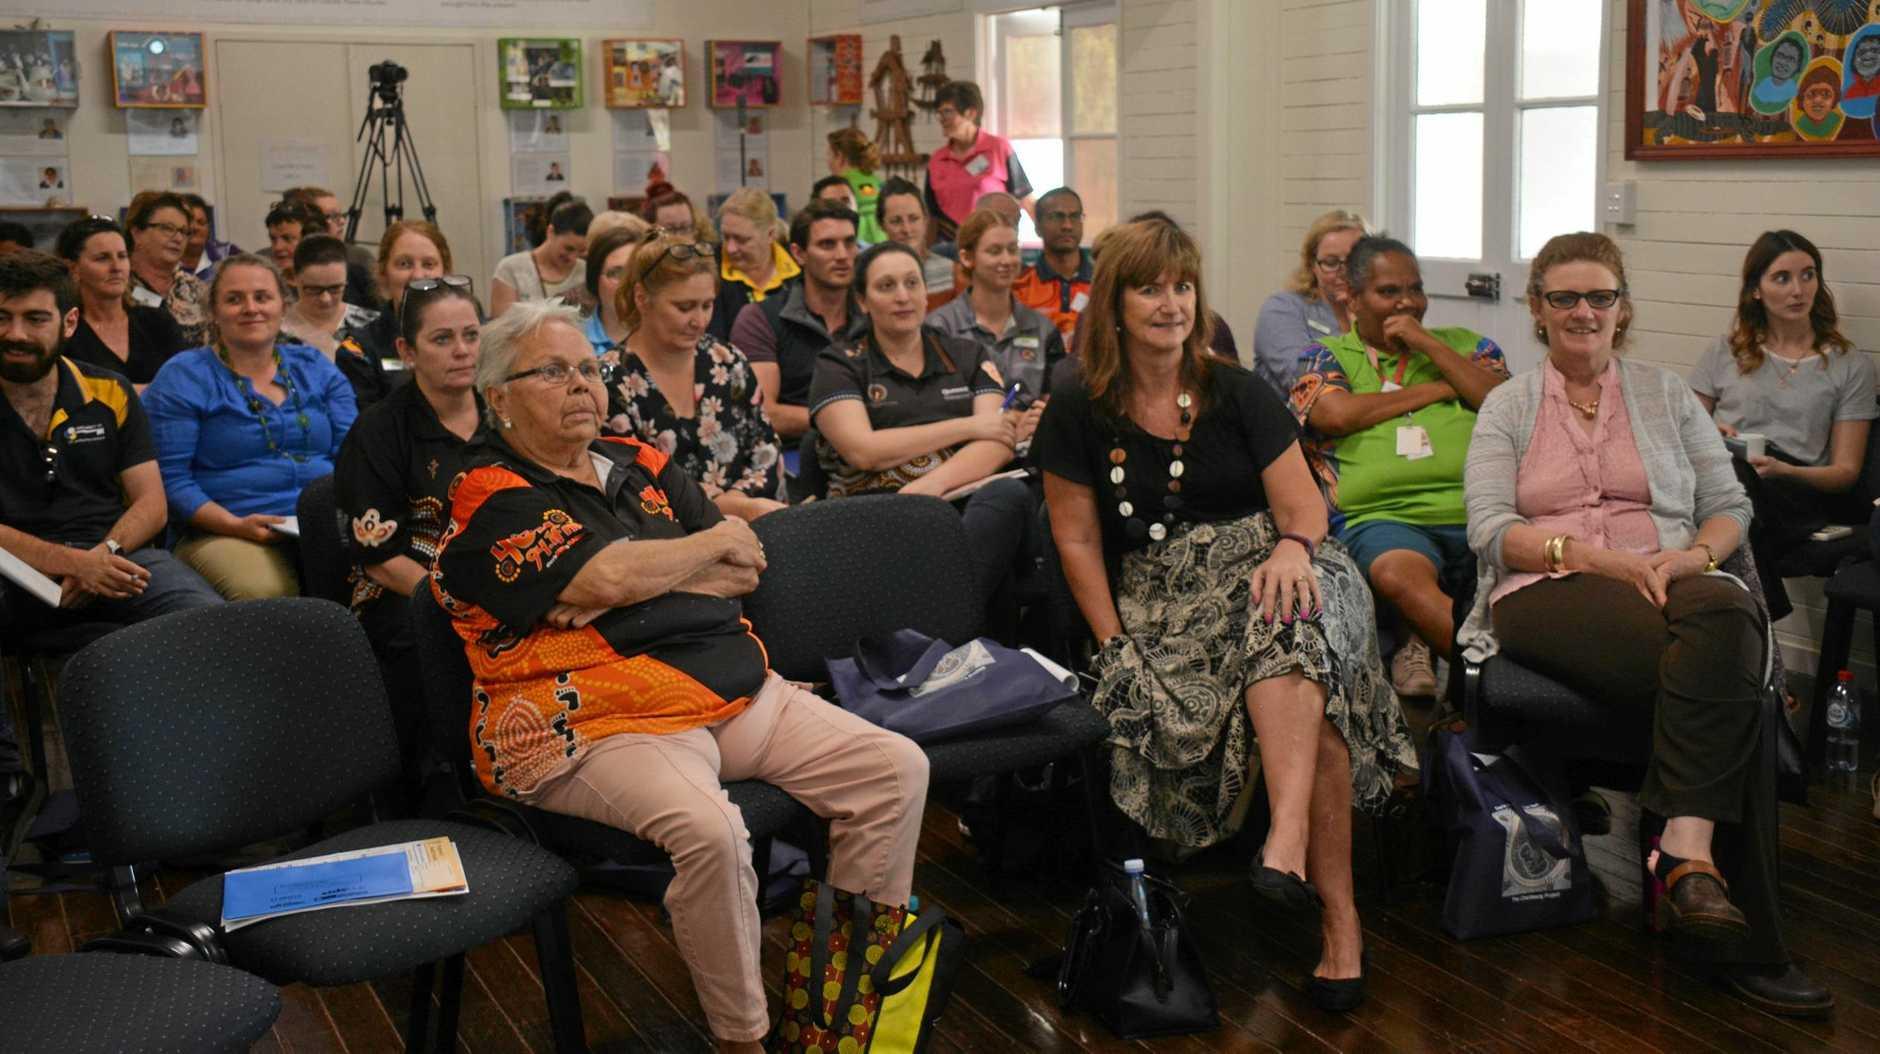 EQUIPPING: South Burnett professionals attend the Fetal Alcohol Spectrum Disorder workshop in Cherbourg led by University of Sydney pediatrics Professor Elizabeth Elliott on Tuesday October 9.